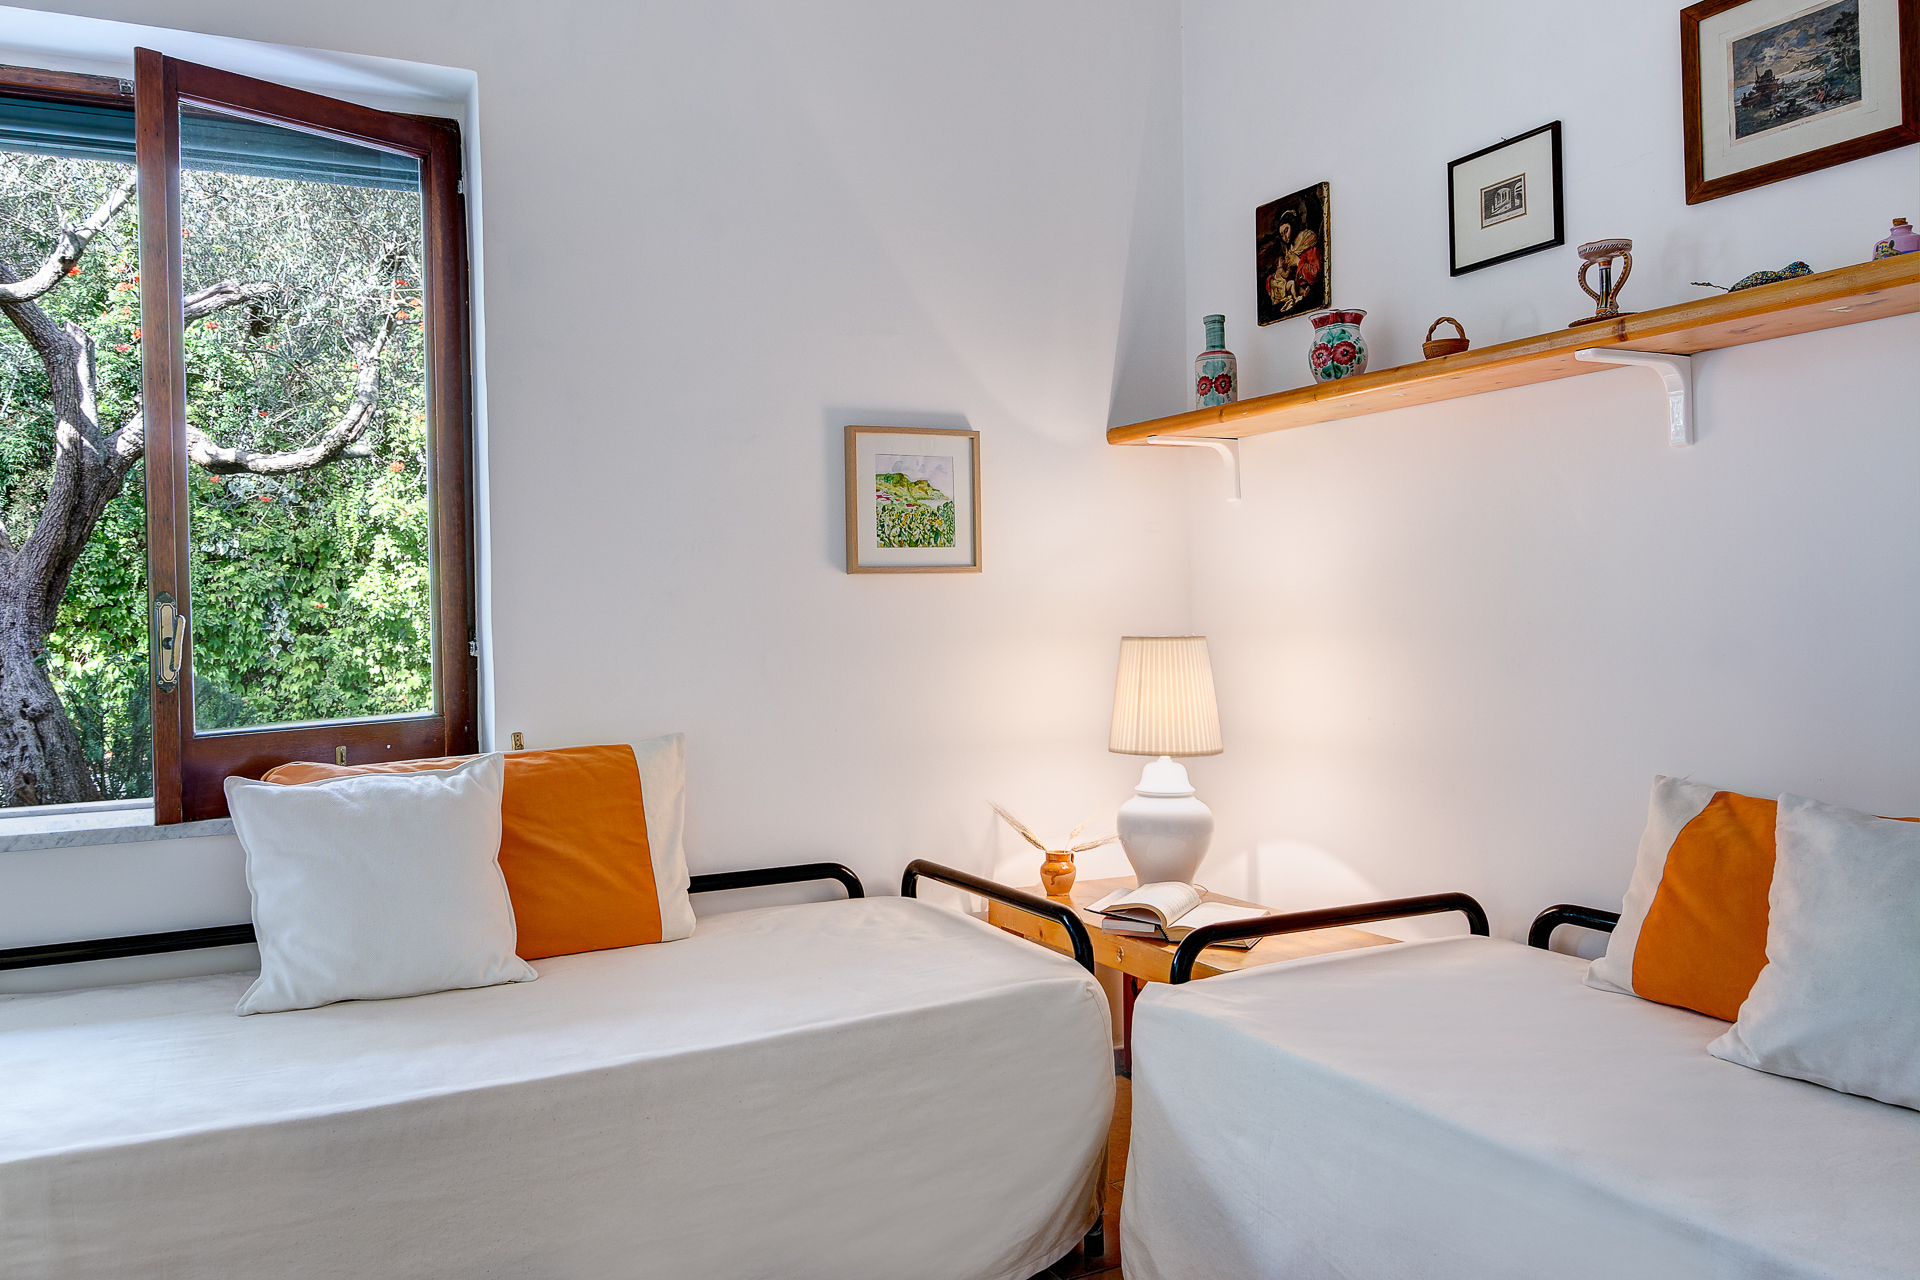 Apartment Casa Elisa - Spectaular Views to the Amalfi Coast photo 20285603